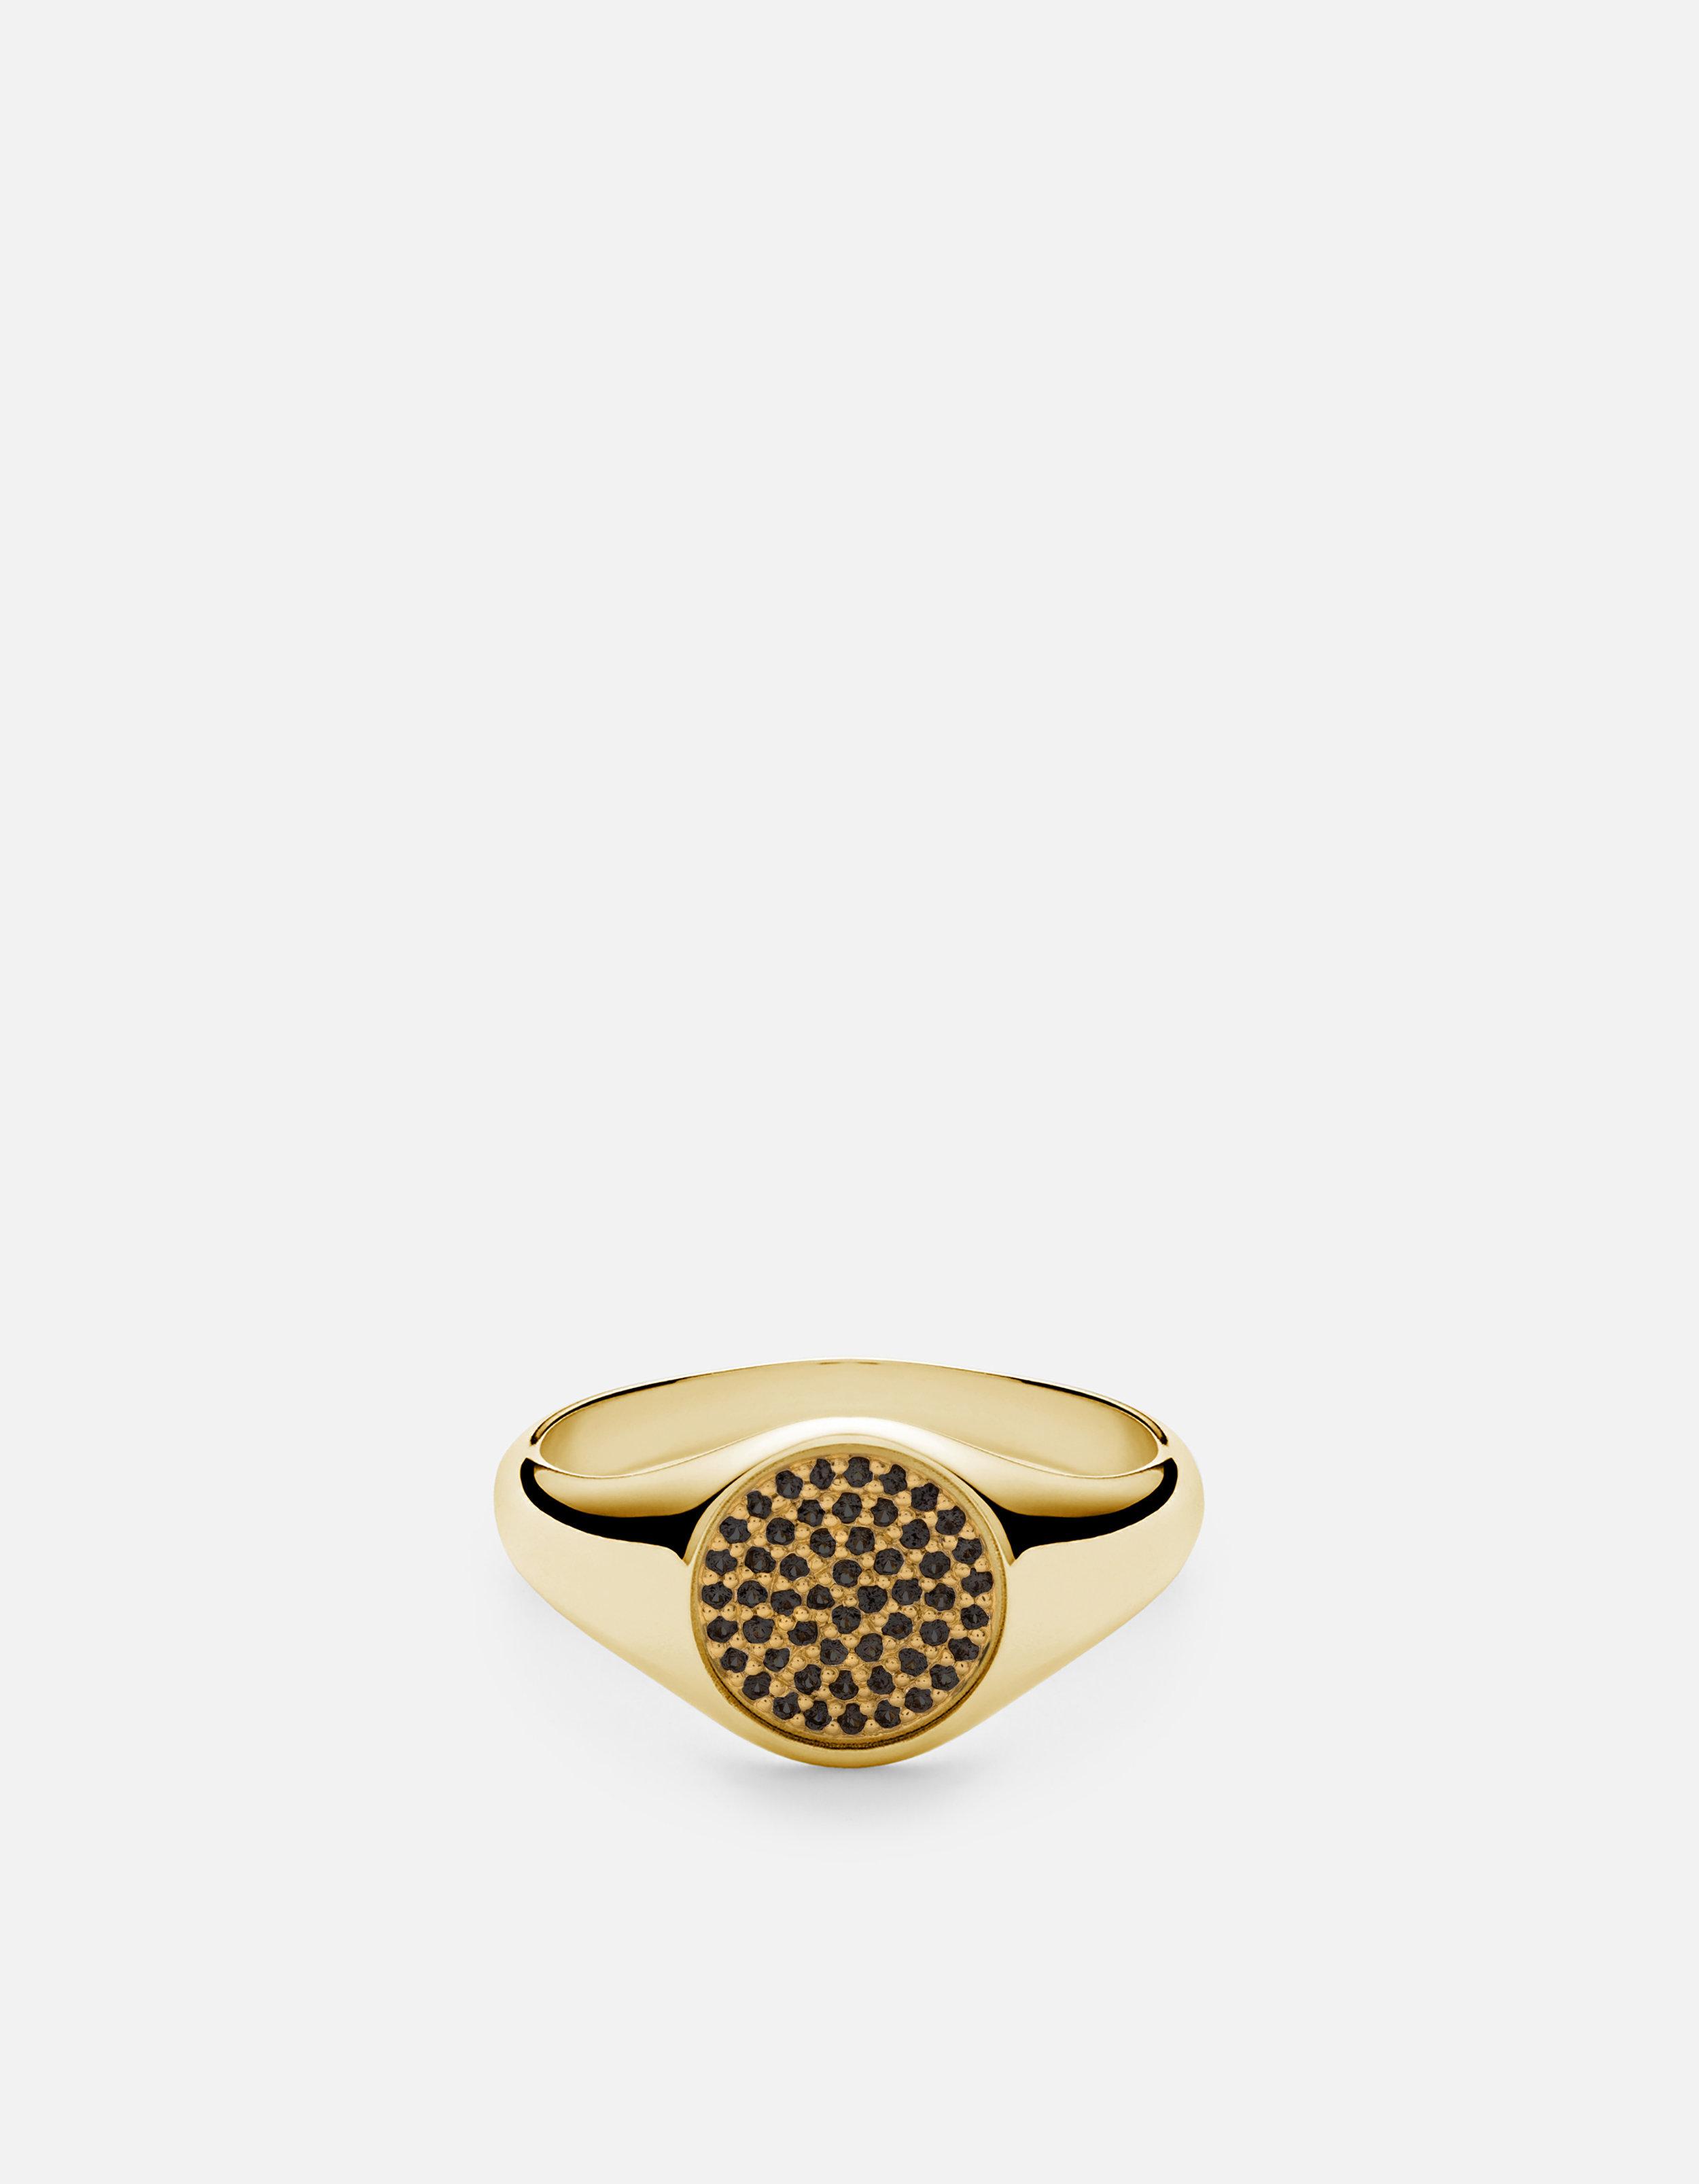 Horizon Signet Ring, Gold Vermeil w blackSapphires_hq.jpg